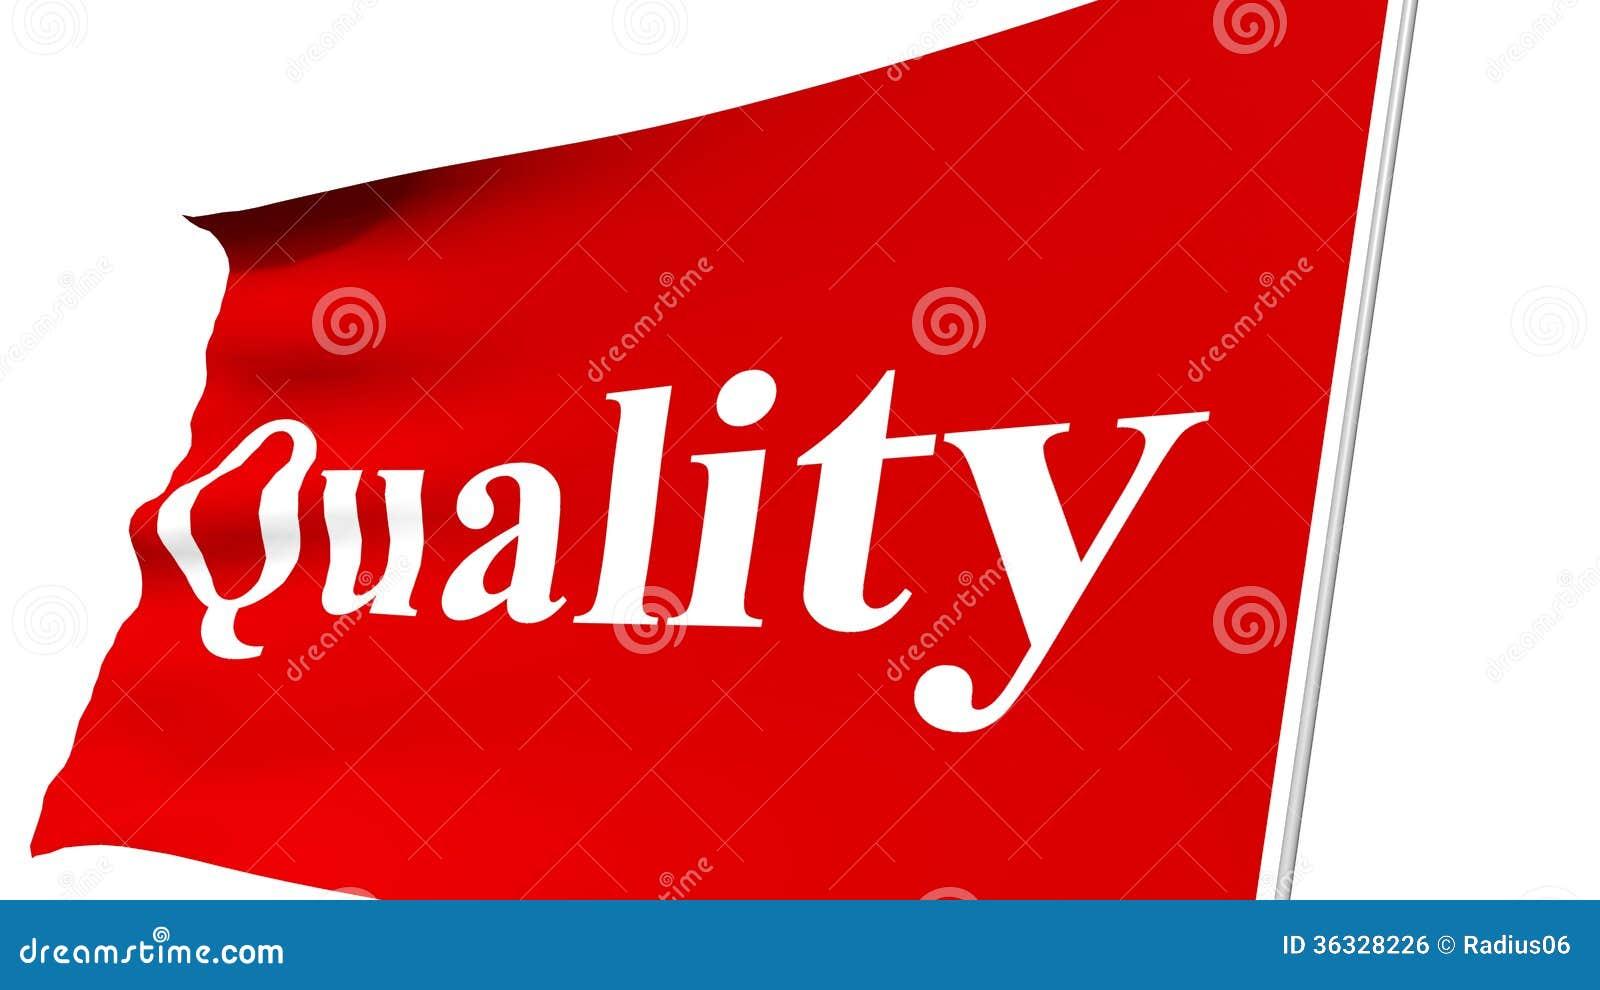 Quality Royalty Free Stock Image - Image: 36328226